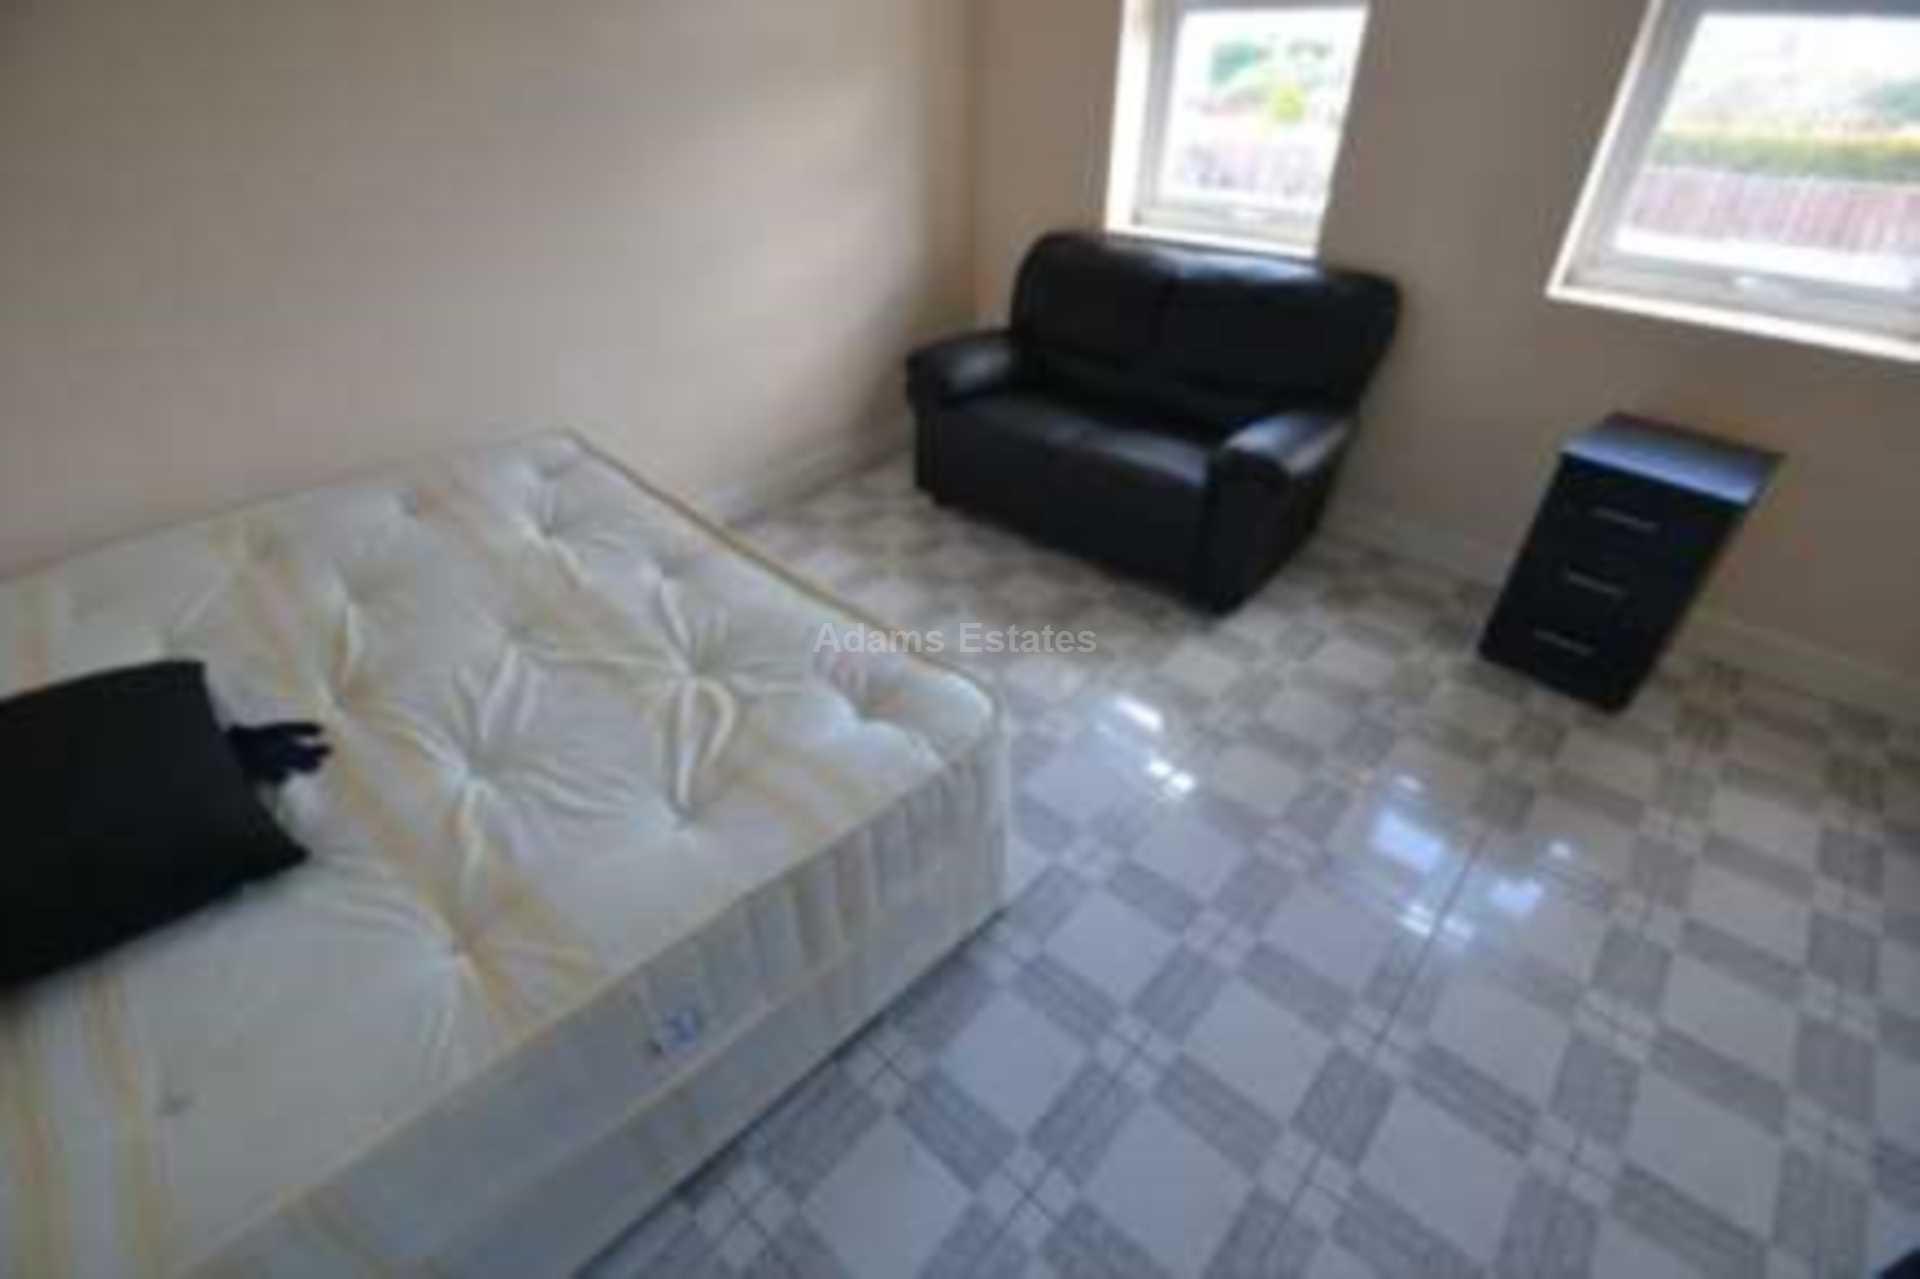 Rooms To Rent In Reading Rg Adams Estates